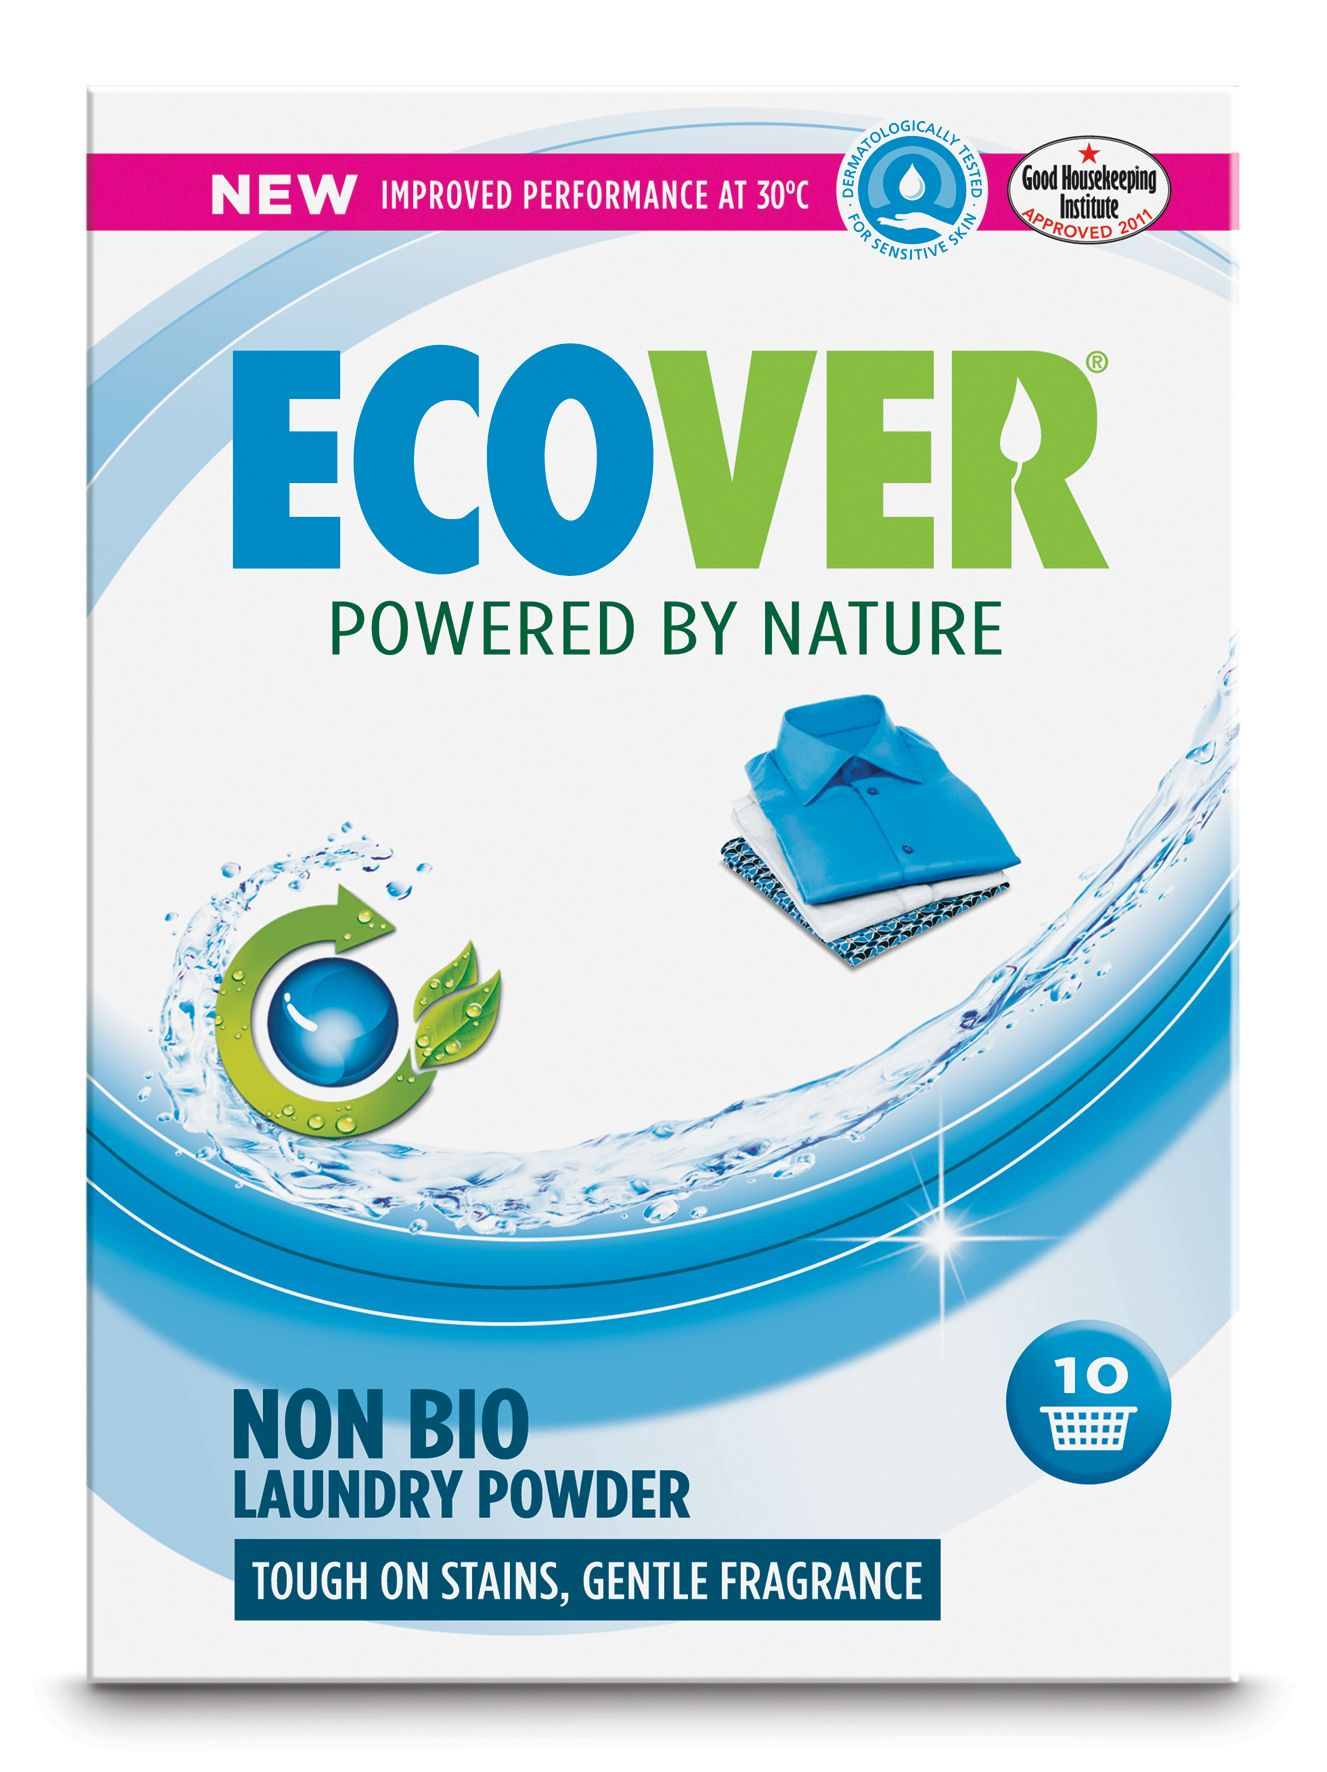 17403 Ecover Non Bio Washing Powder 0 75kg11 Jpg 1327 1772